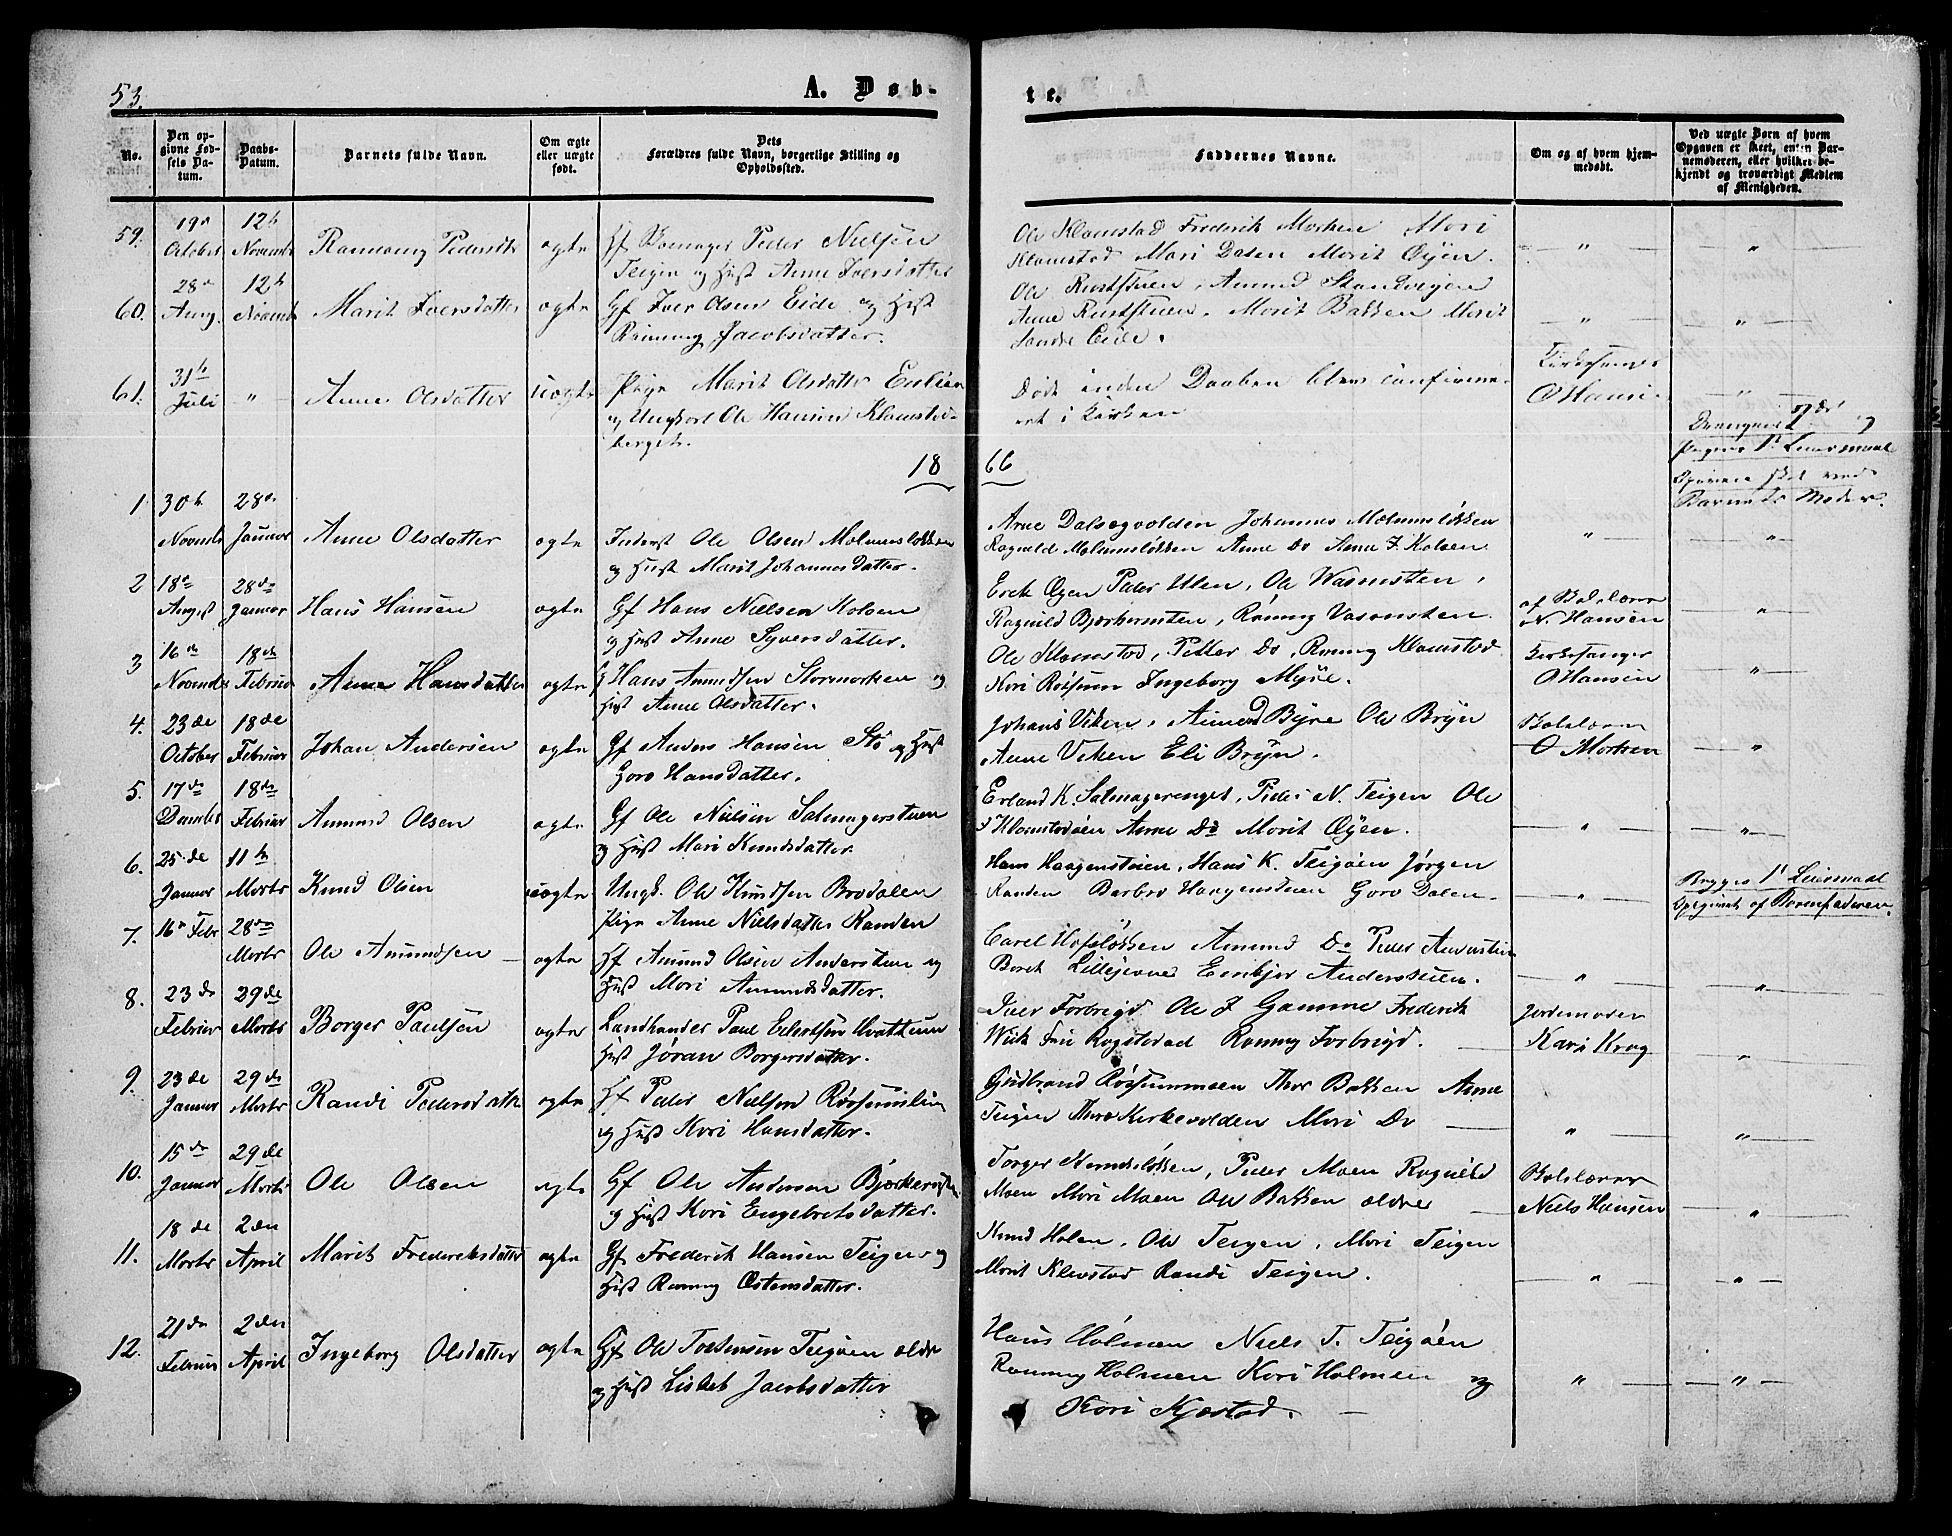 SAH, Nord-Fron prestekontor, Klokkerbok nr. 3, 1851-1886, s. 53